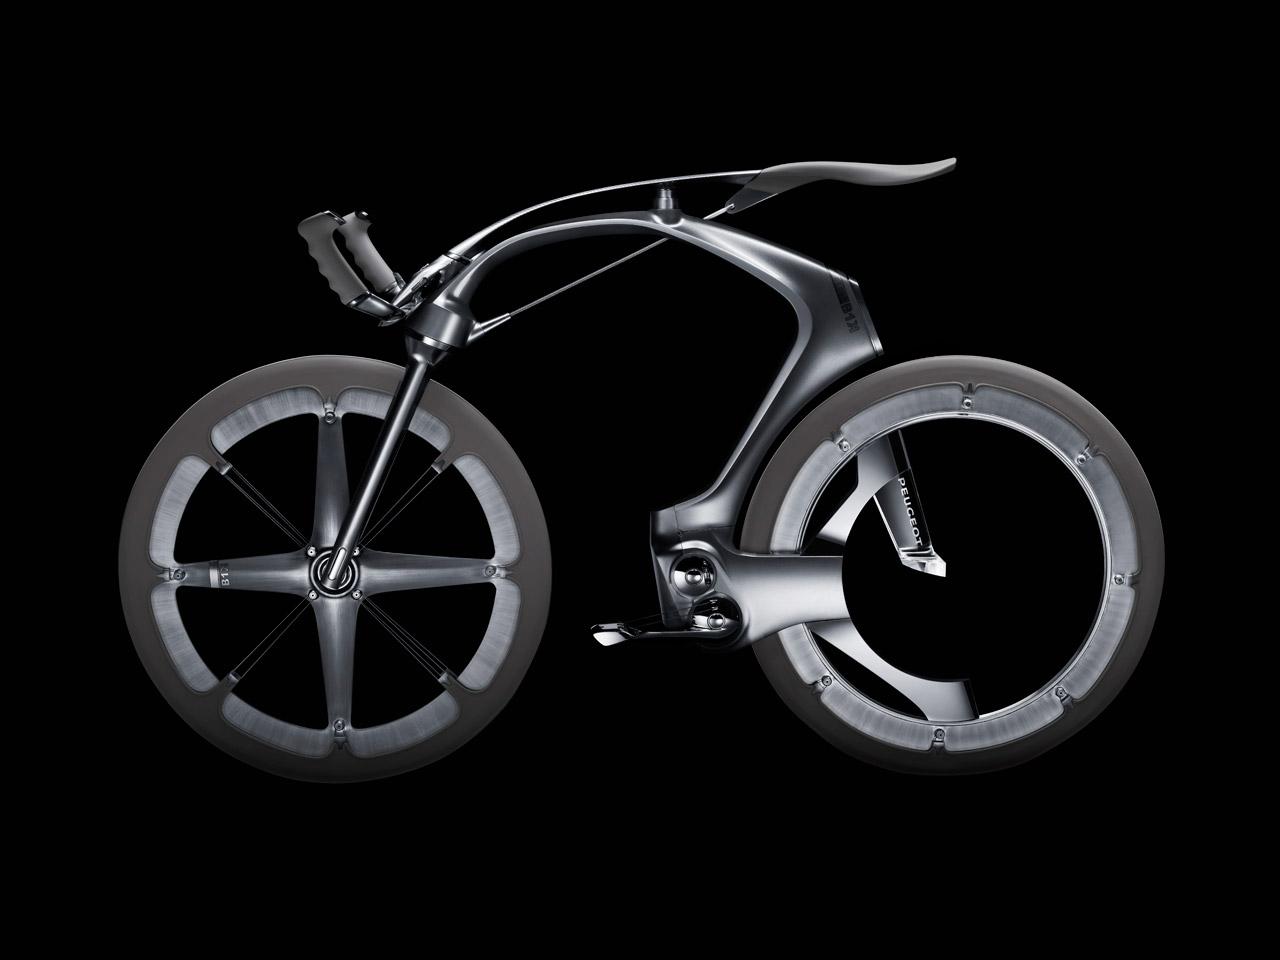 https://i1.wp.com/www.carbodydesign.com/archive/2010/02/peugeot-b1k-bike-concept/_Peugeot-B1K-Bike-Concept-1-lg.jpg